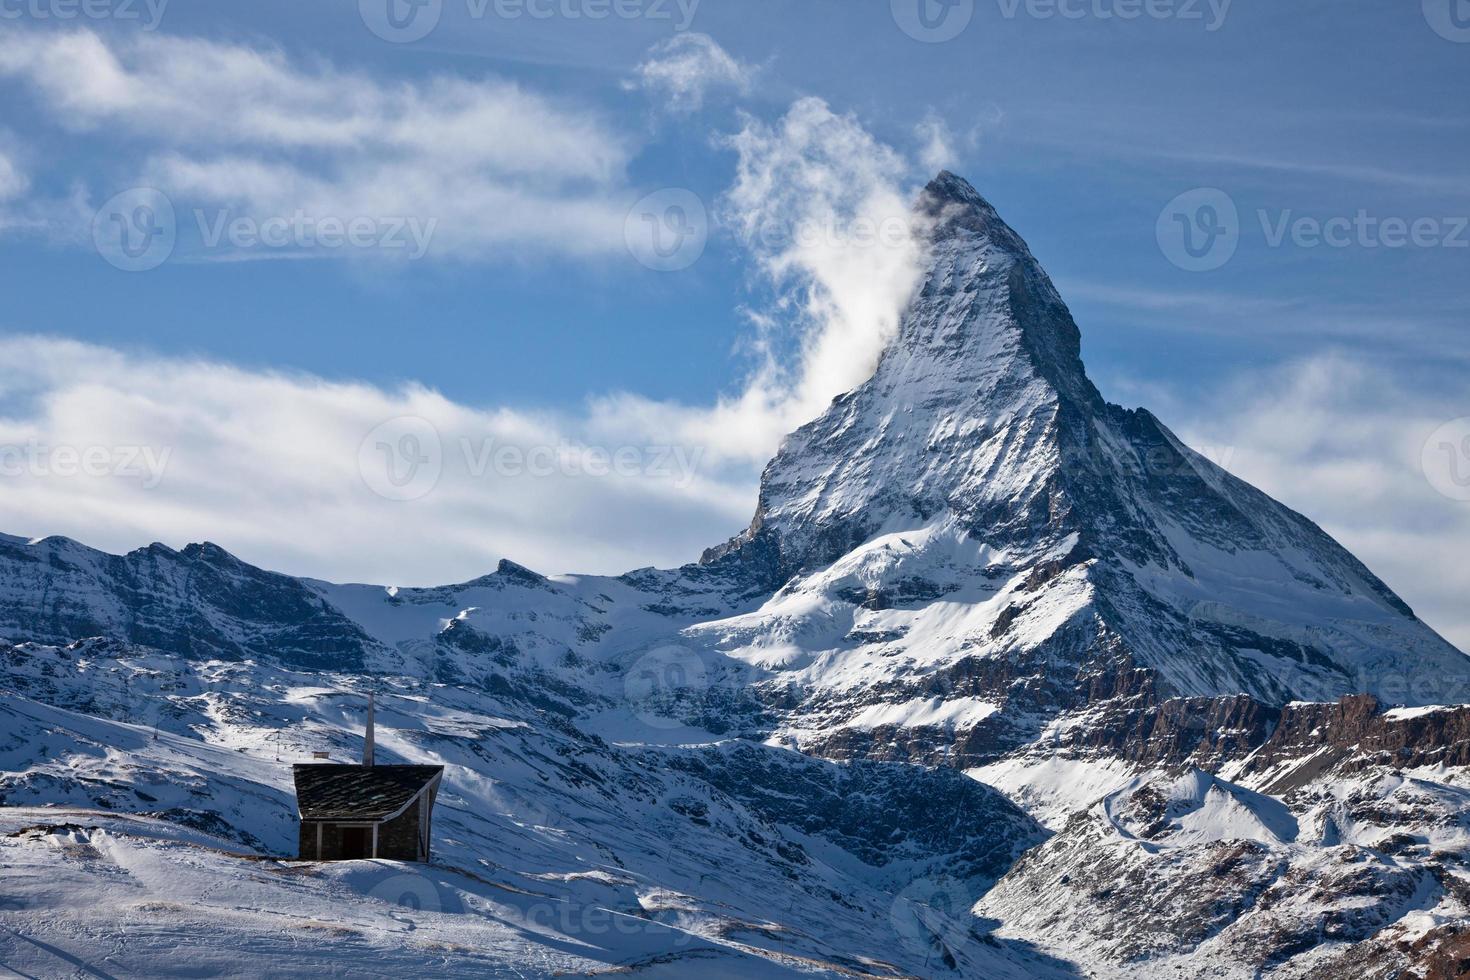 Riffelberg Chapel in the snow below the Matterhorn photo